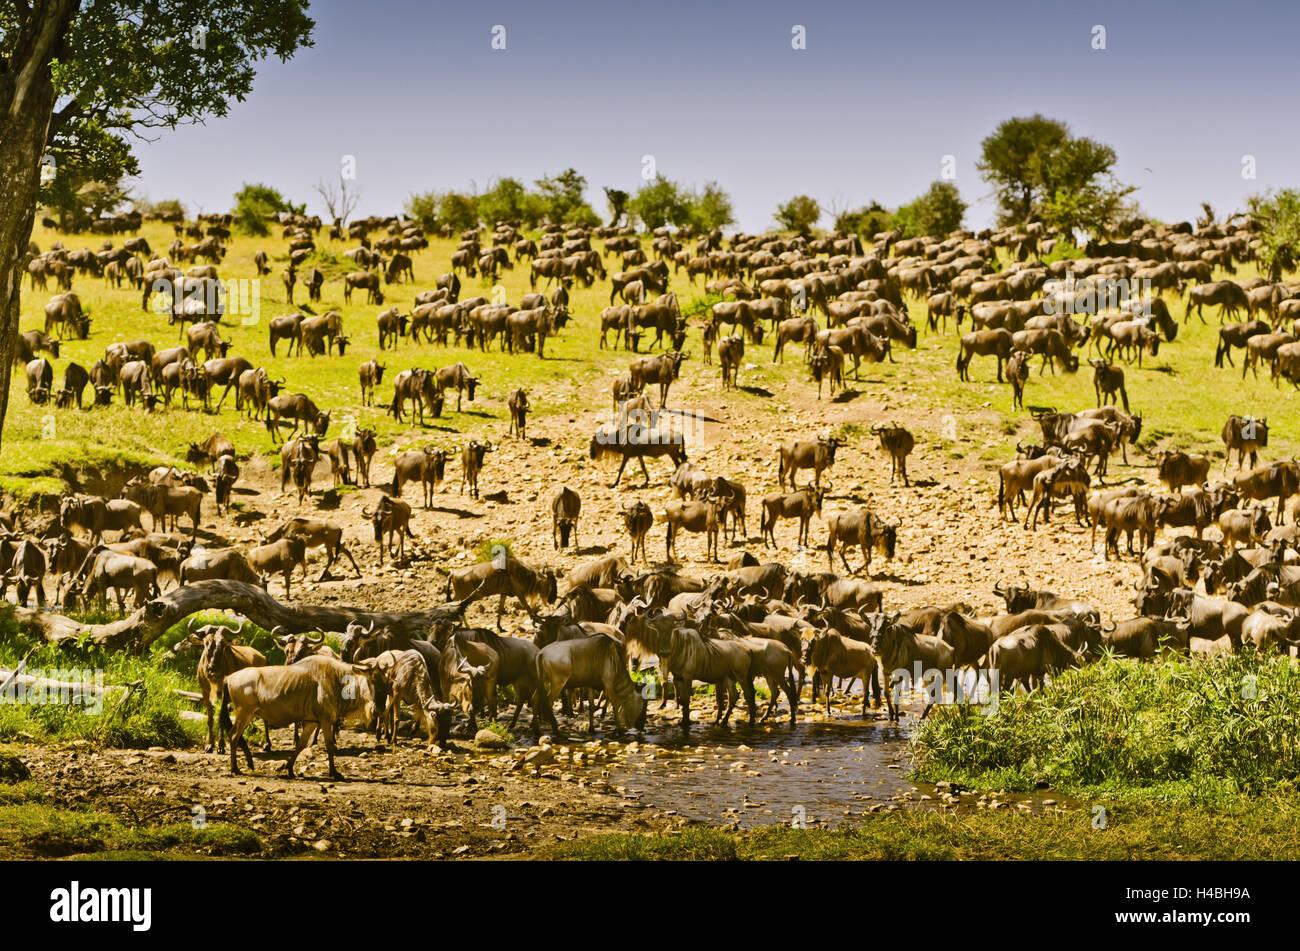 África, África Oriental, Tanzania Serengeti, vida silvestre, ñúes, Imagen De Stock